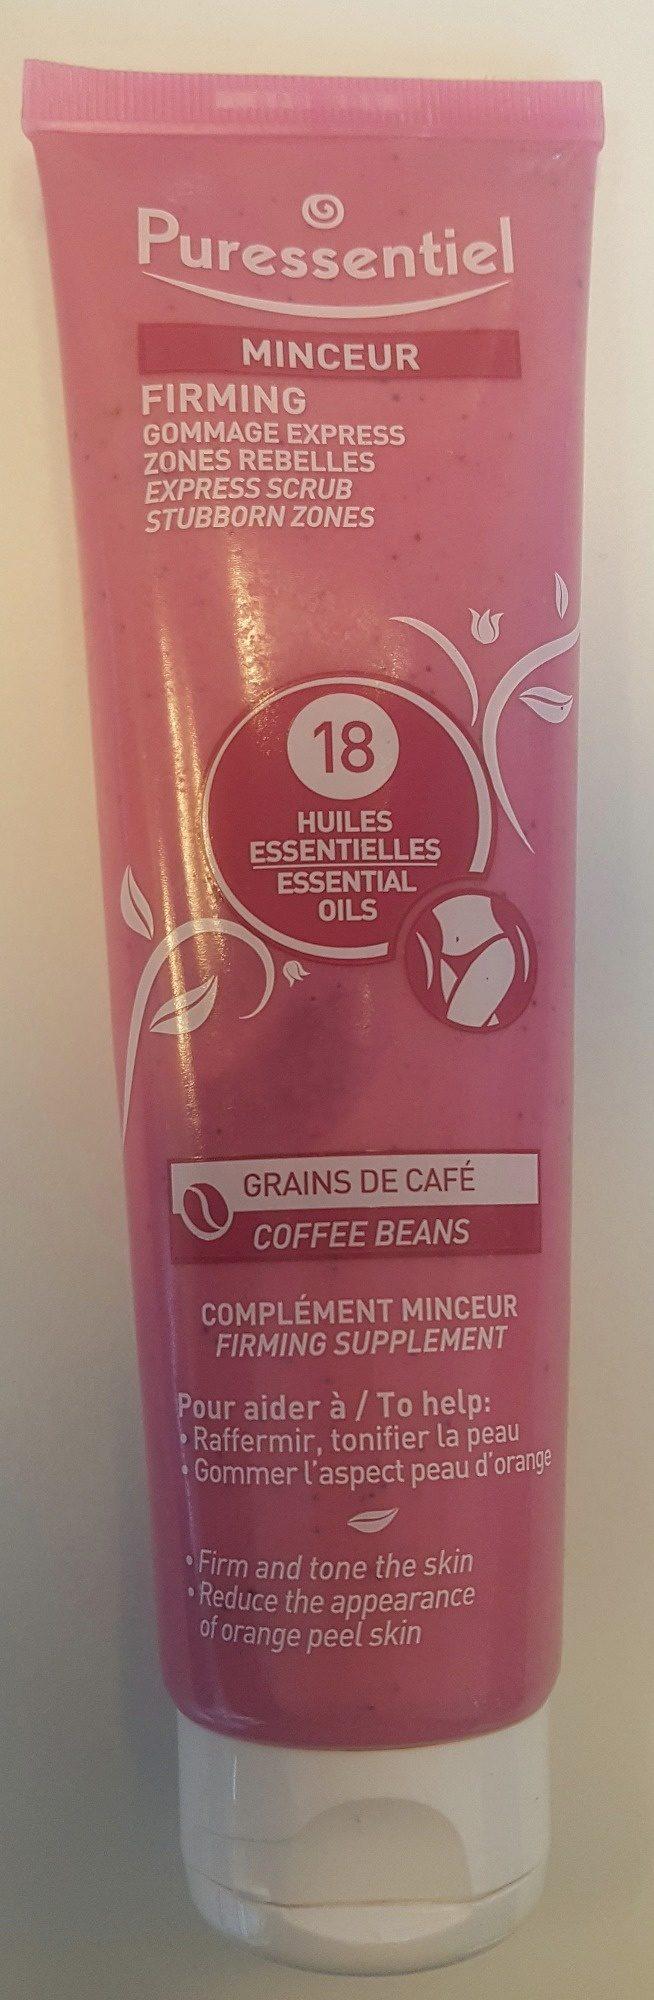 Puressentiel Minceur Gommage Express 18 huiles essentielles - Product - fr